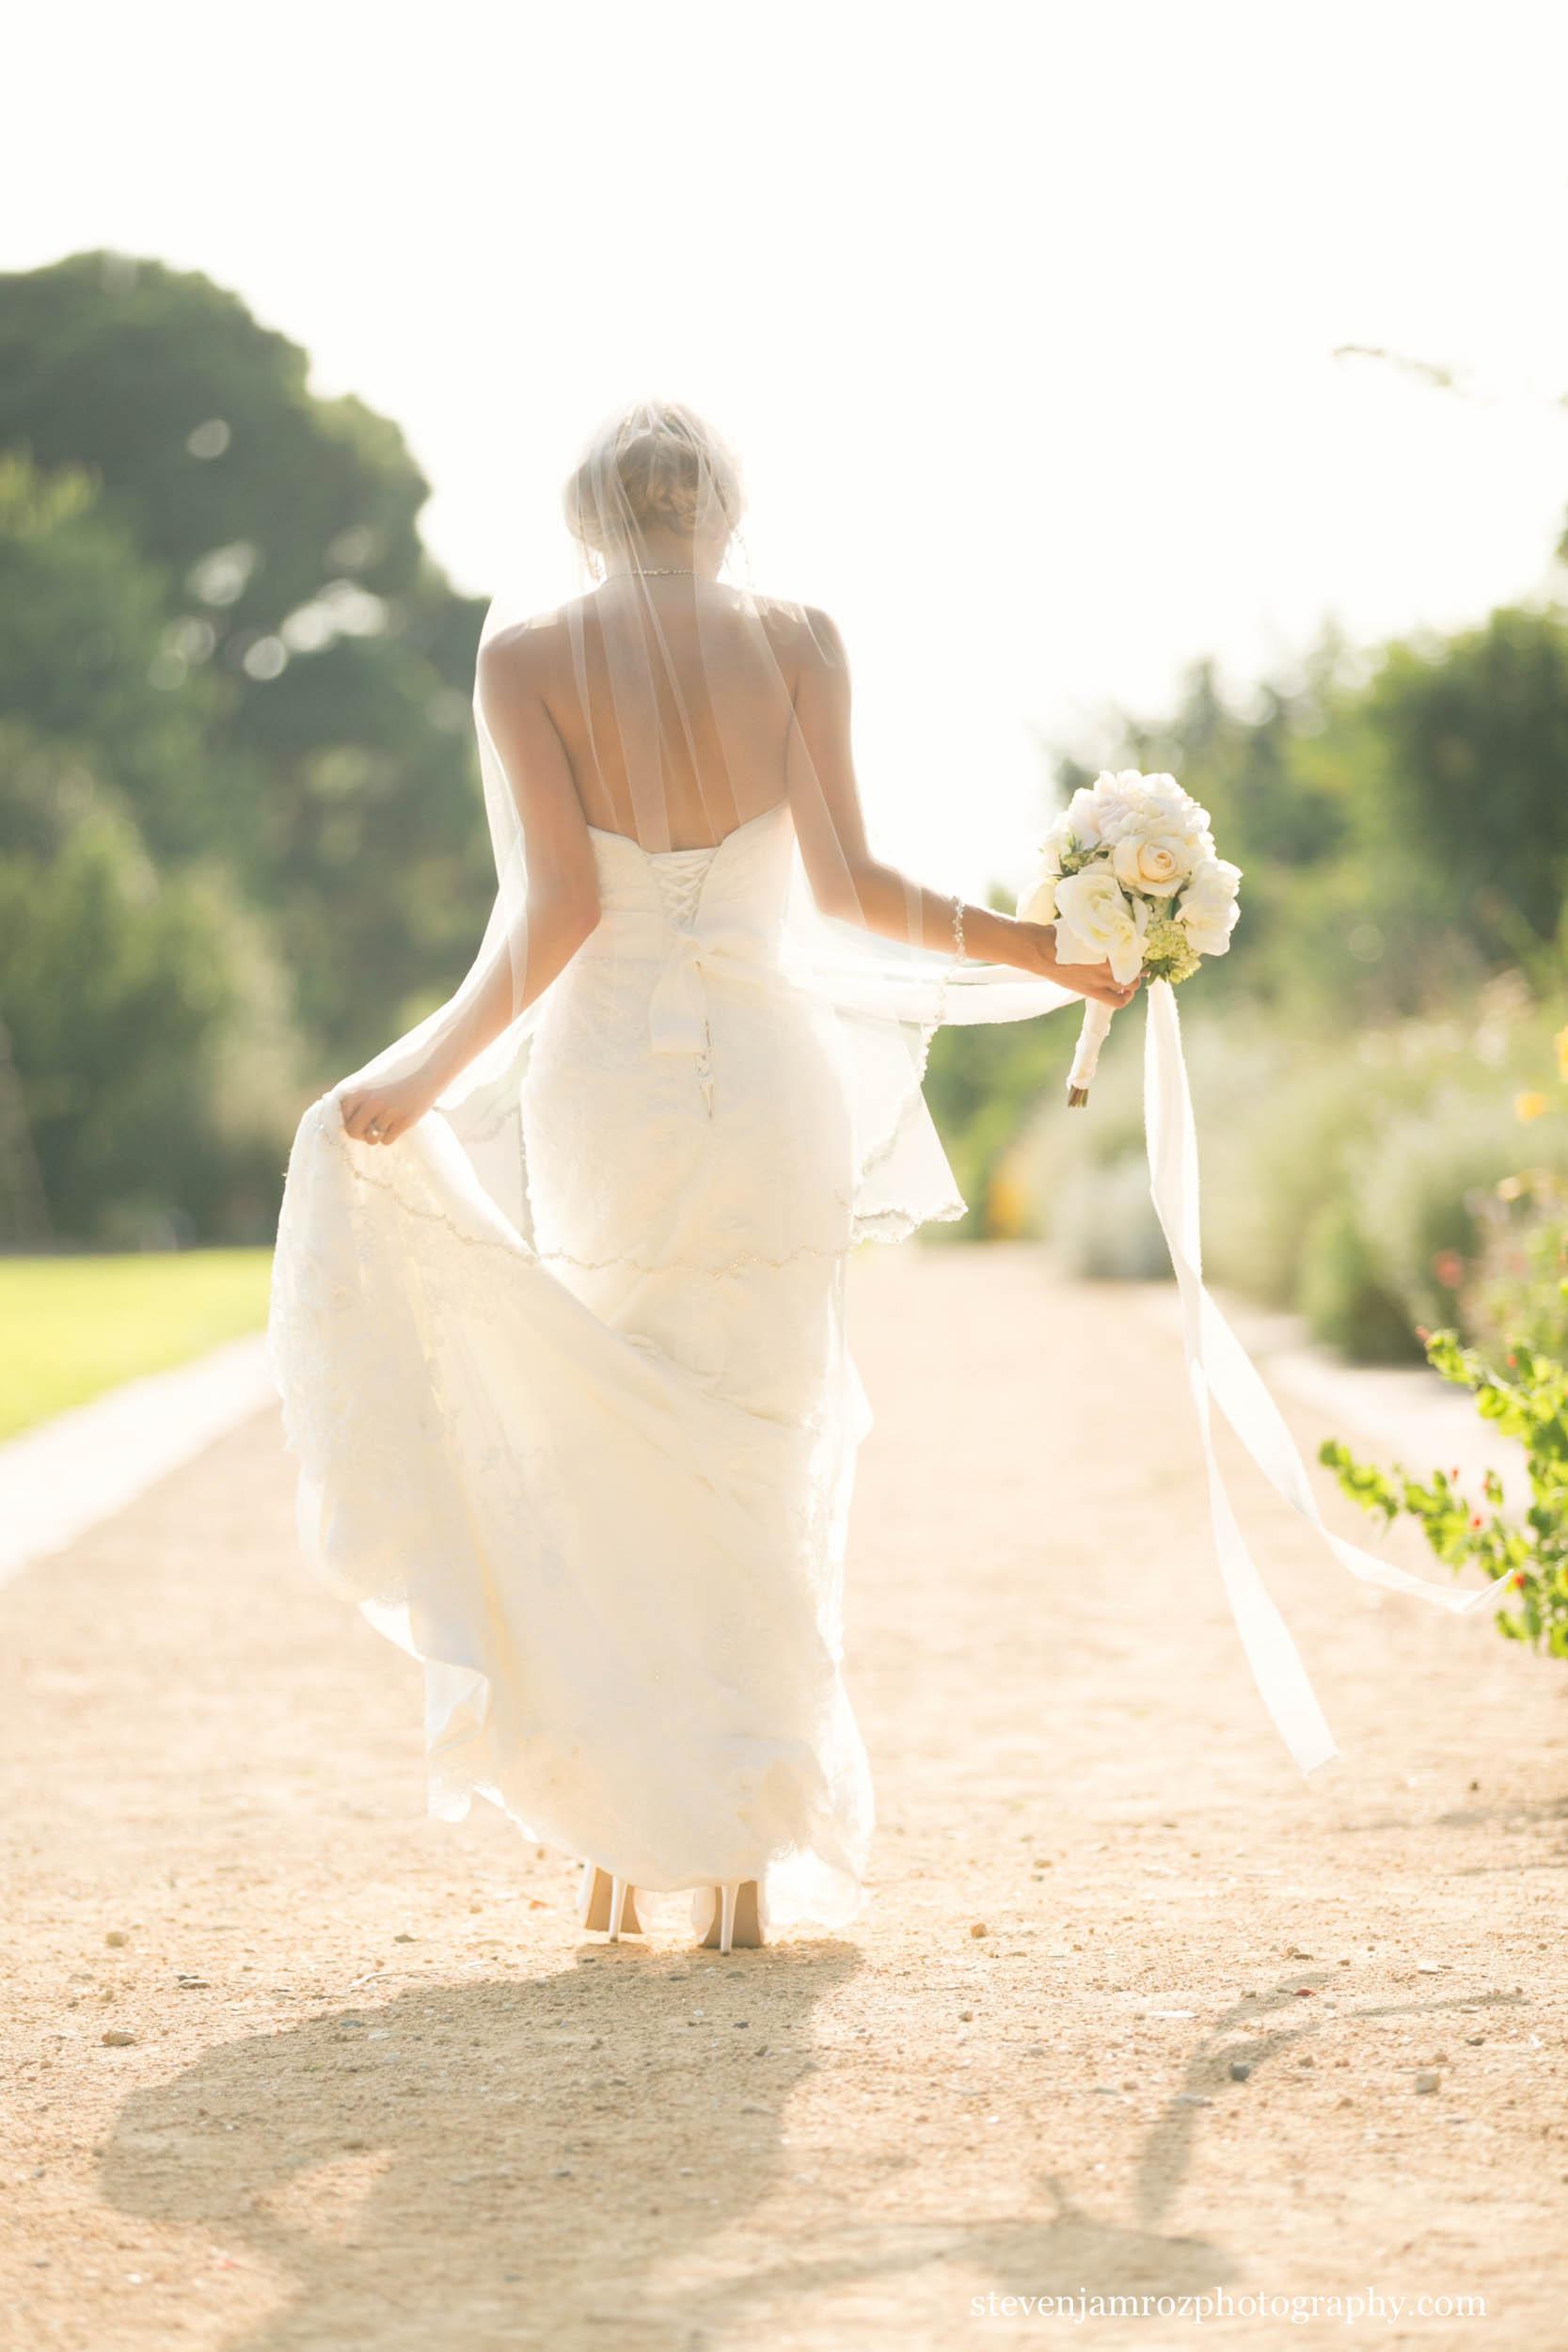 natural-light-wedding-photographer-steven-jamroz-photography-0541.jpg